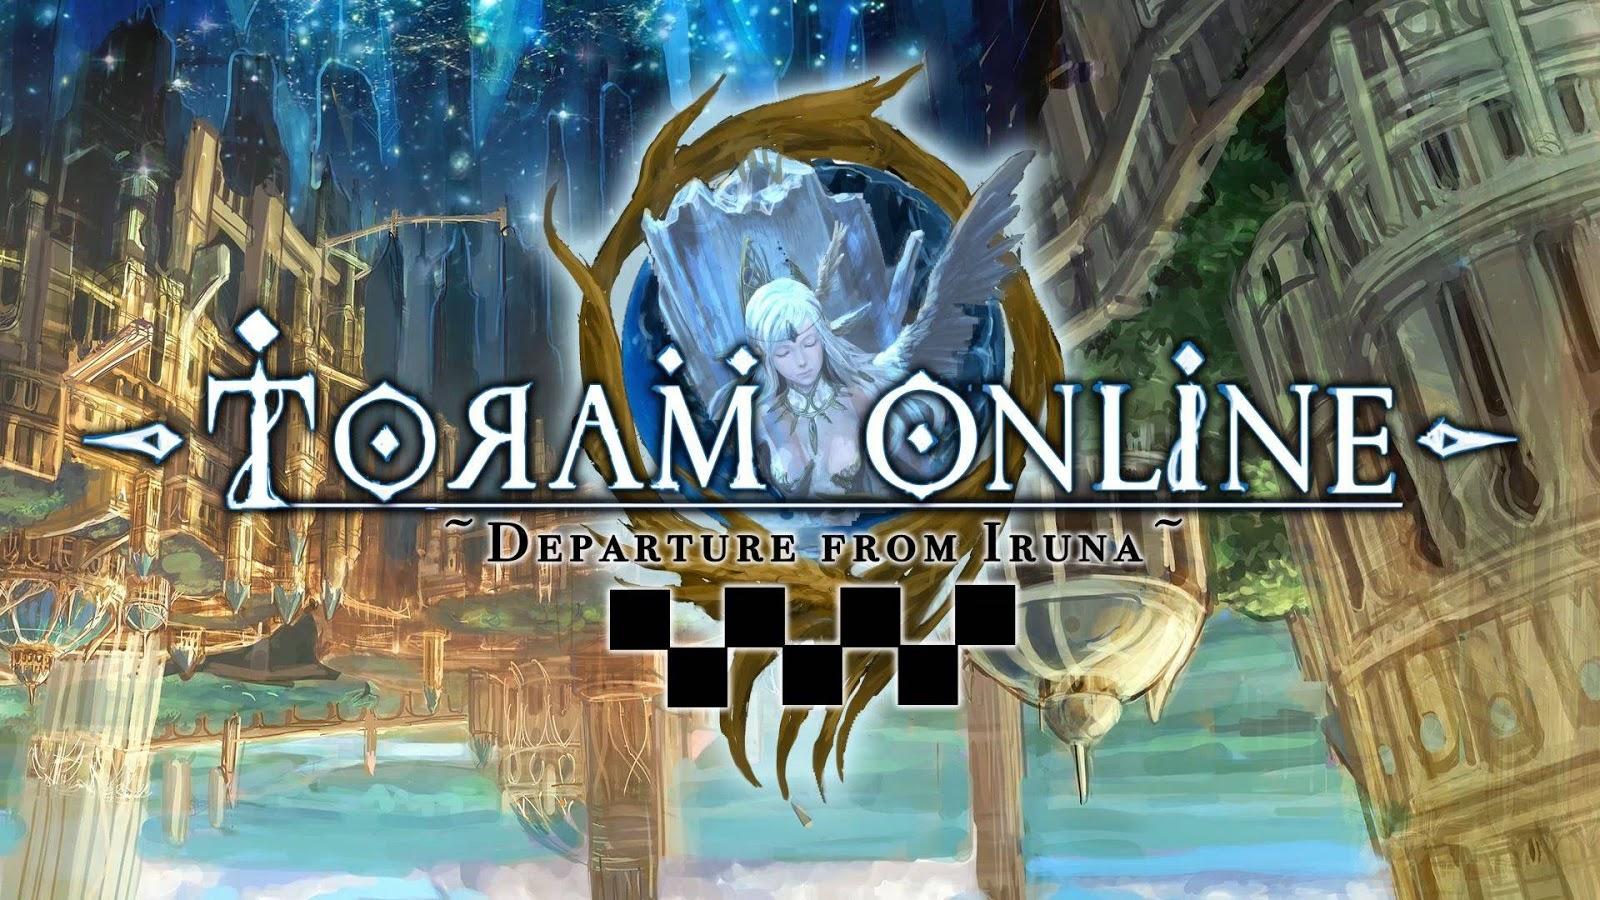 Toram online dresses related keywords